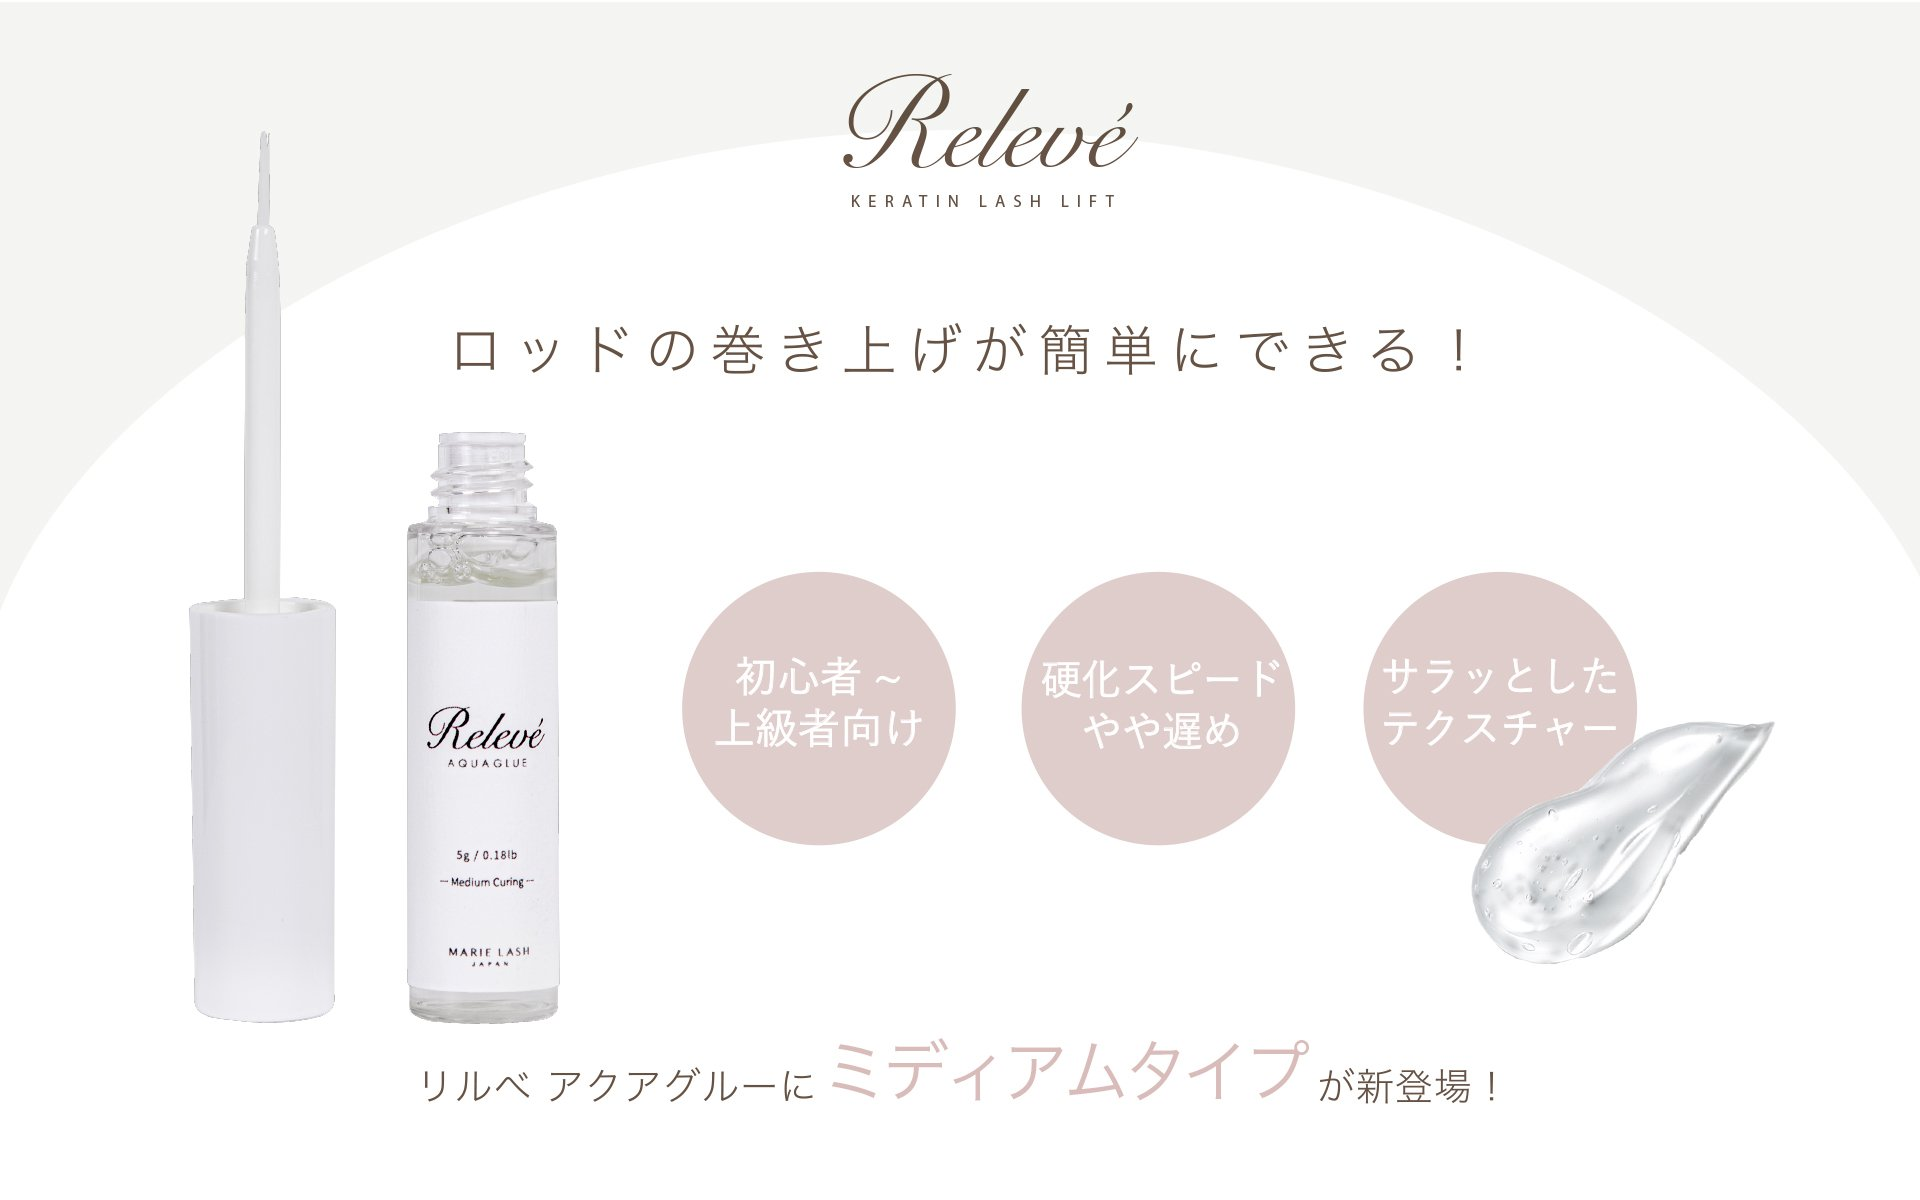 New medium curing lash lift glue by MARIE LASH JAPAN